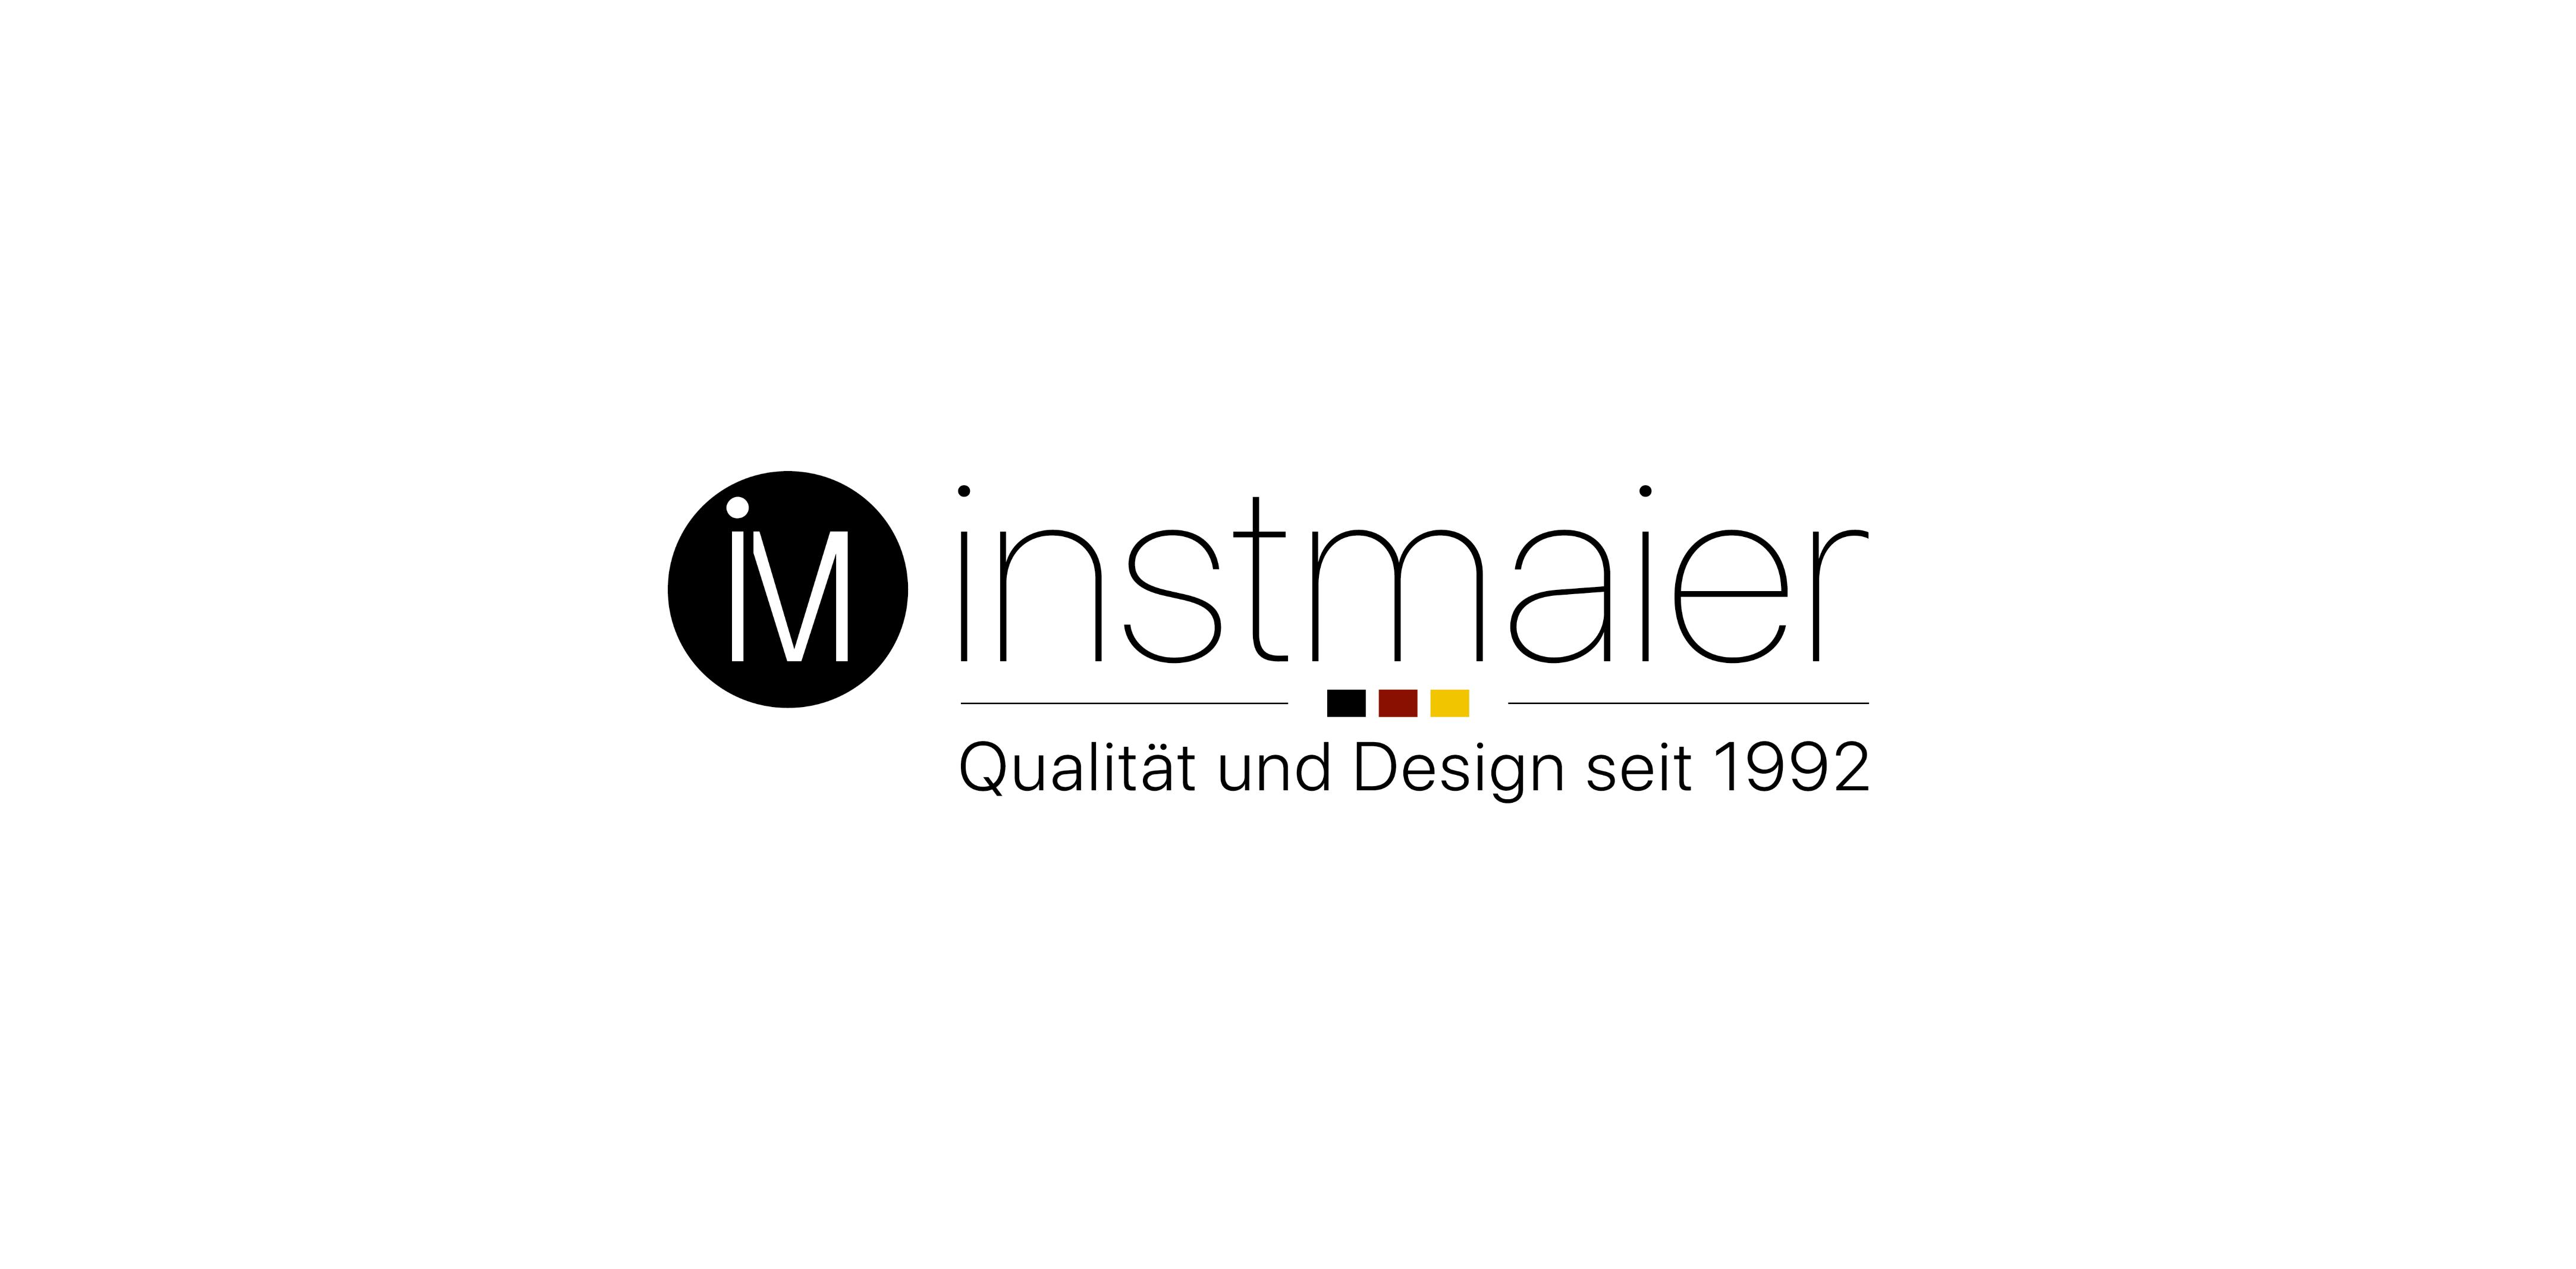 Instmaier In 2020 Design